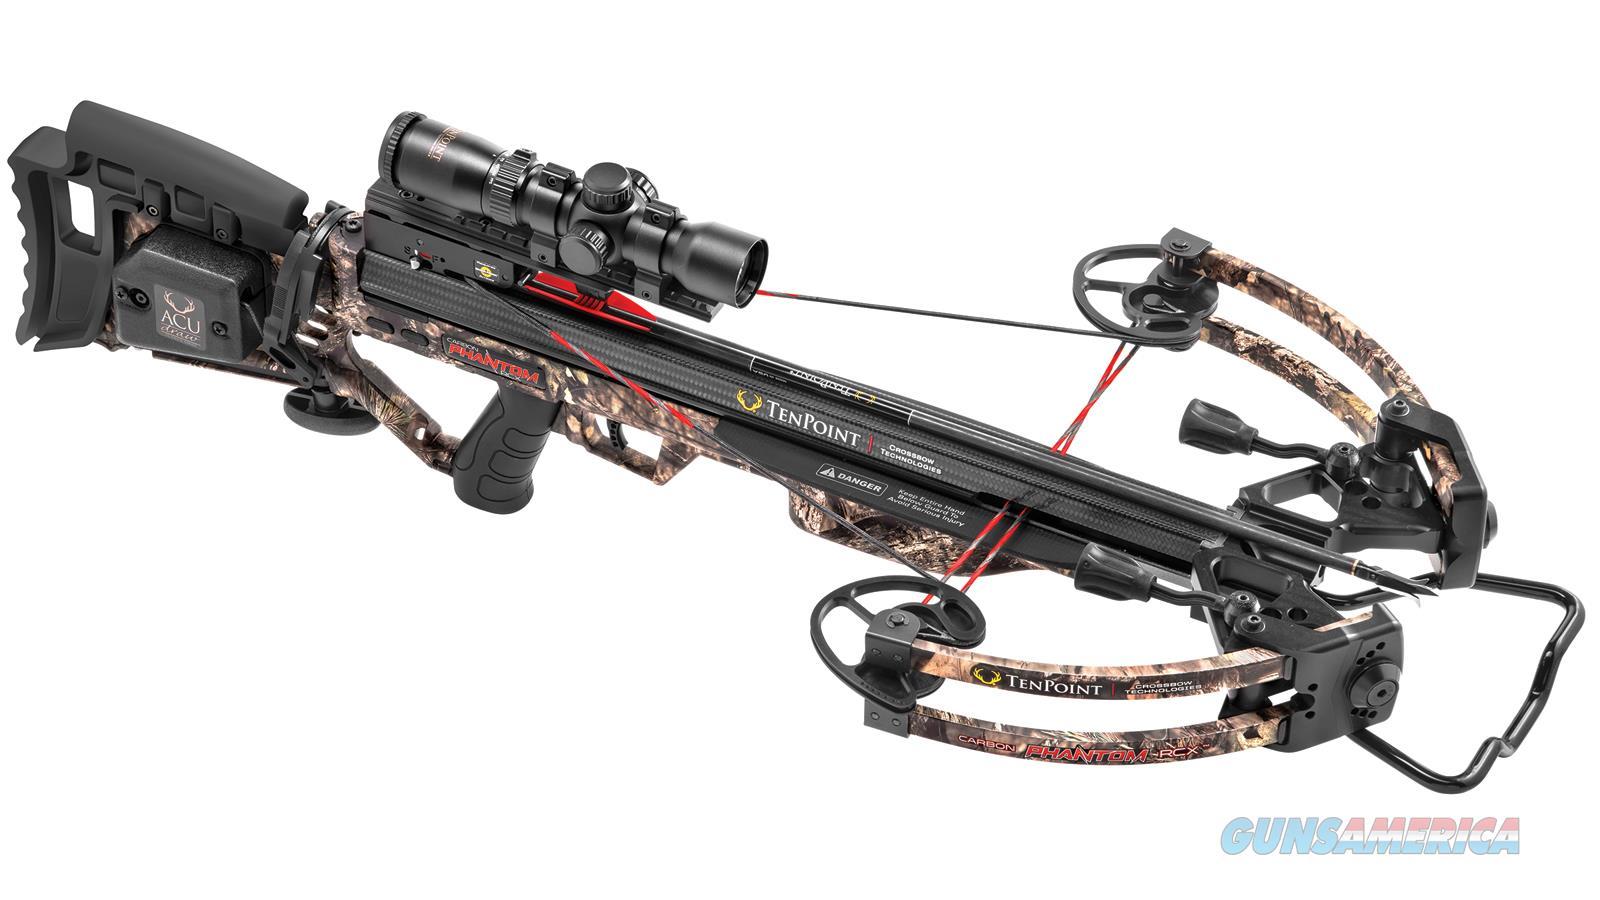 Ten Point Carbon Phantom Rcx Package CB170035112  Non-Guns > Archery > Parts